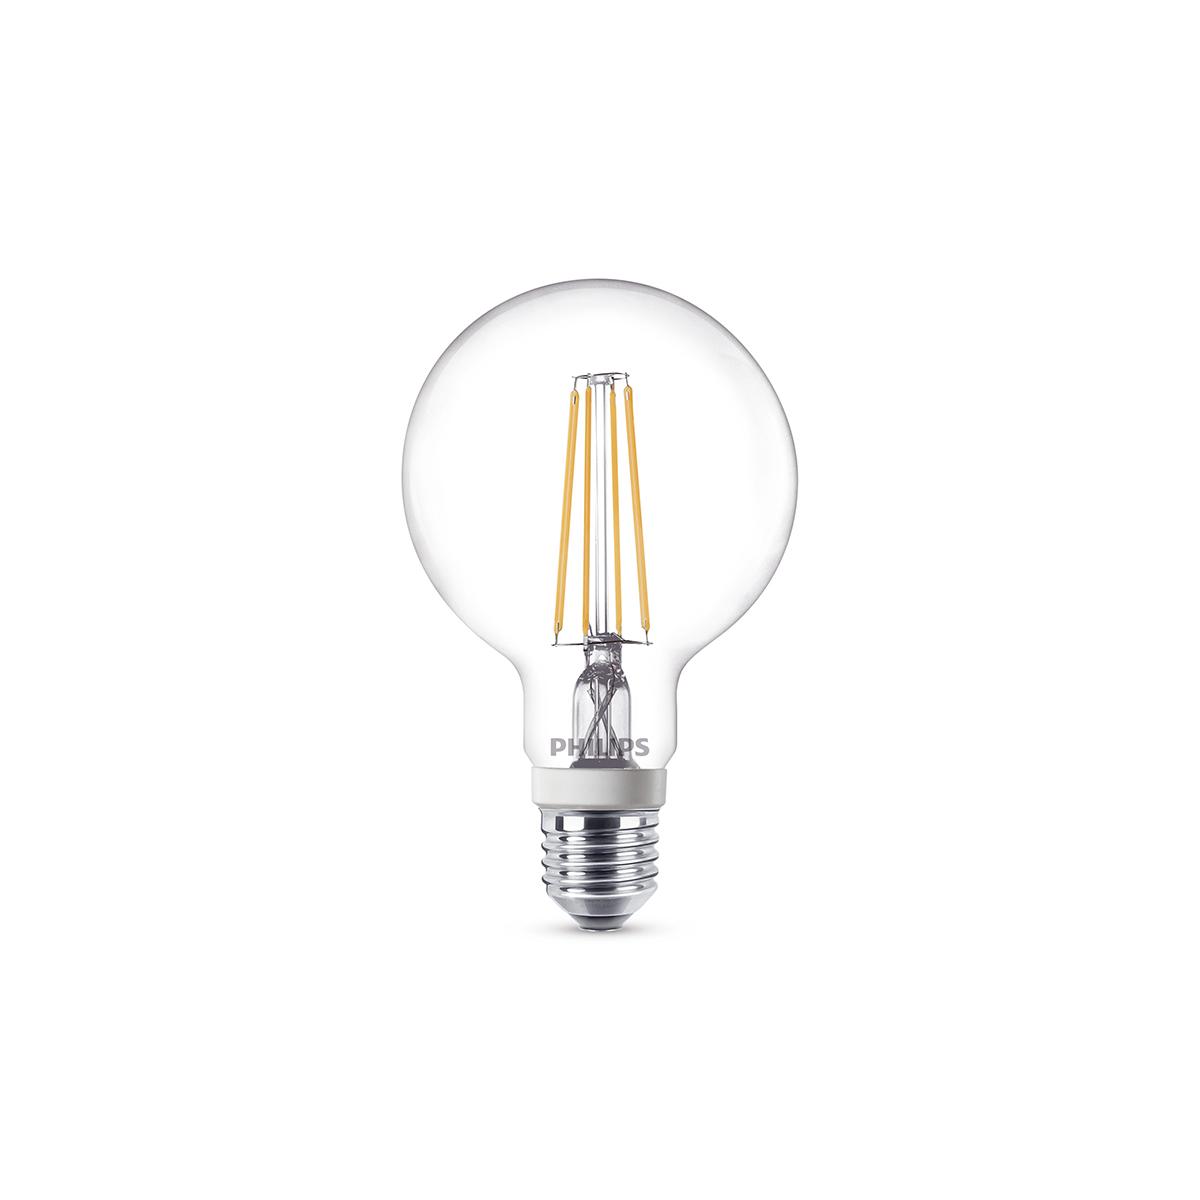 philips leuchtmittel led globe e27 7 w warmwei dimmbar. Black Bedroom Furniture Sets. Home Design Ideas